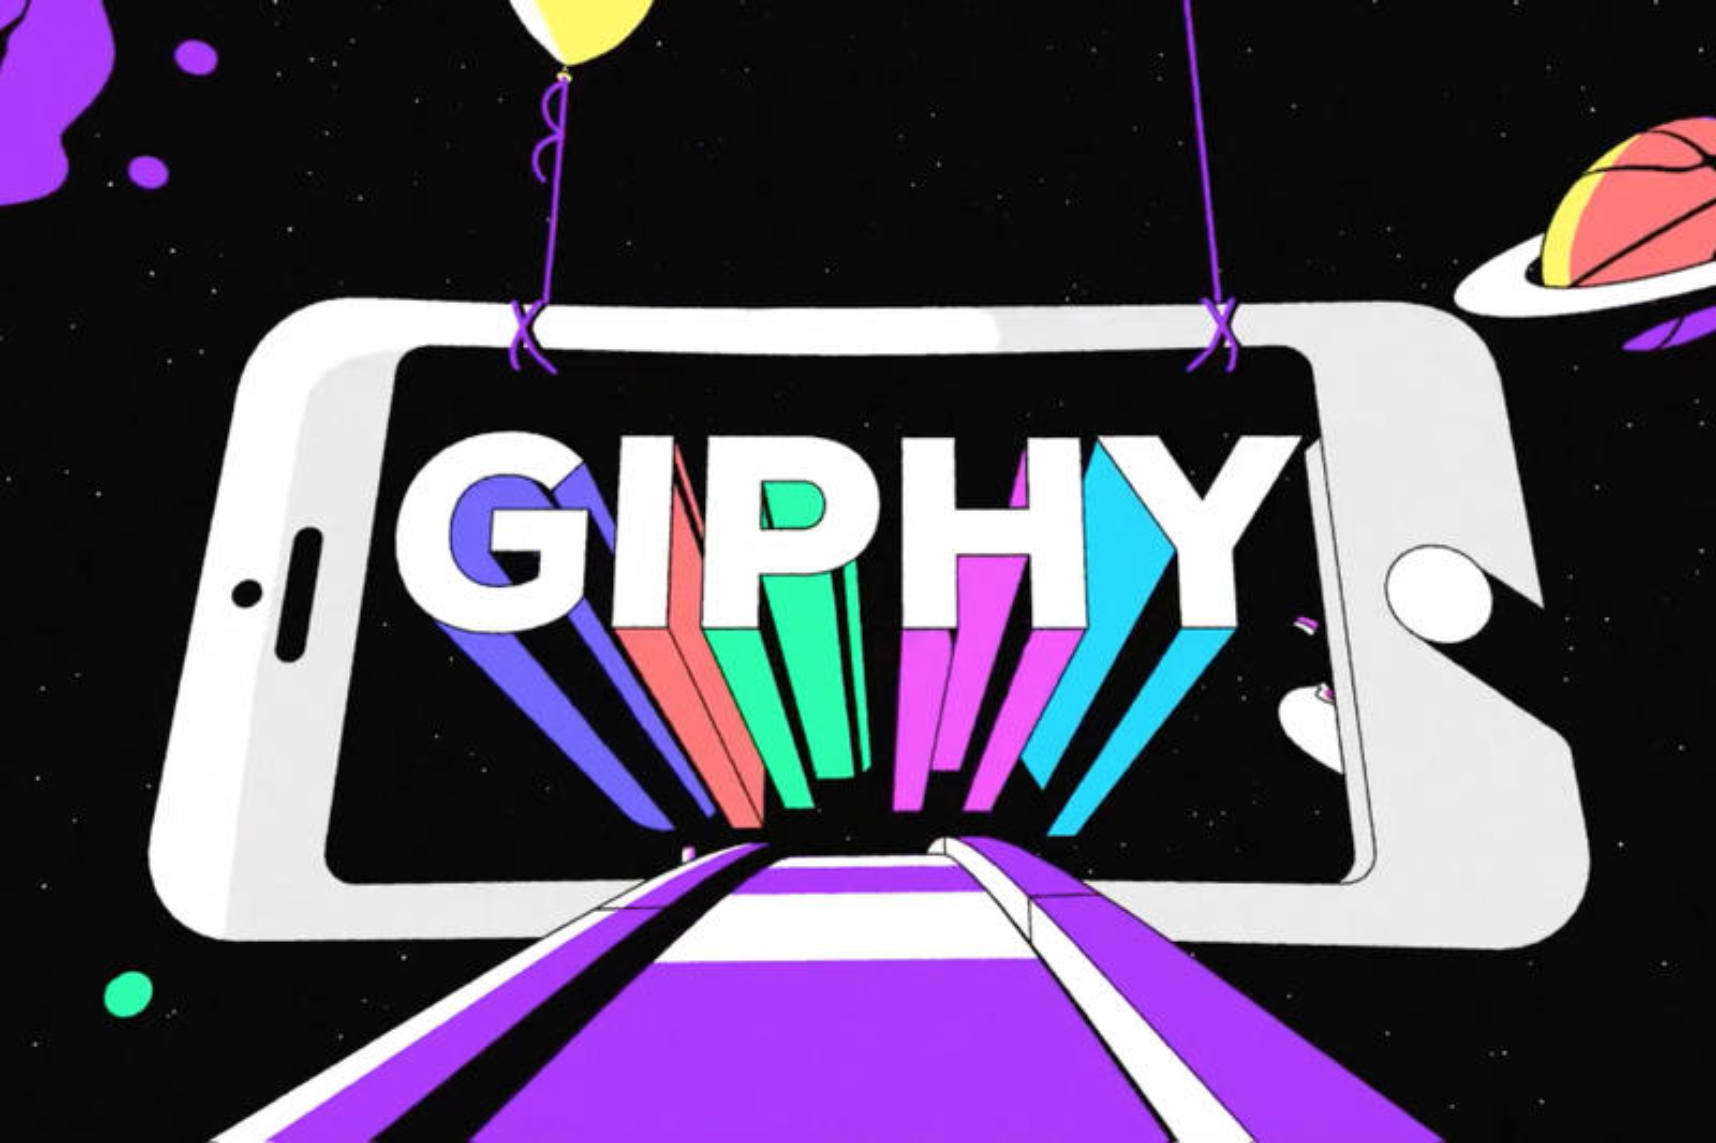 Resultado de imagen para Giphy